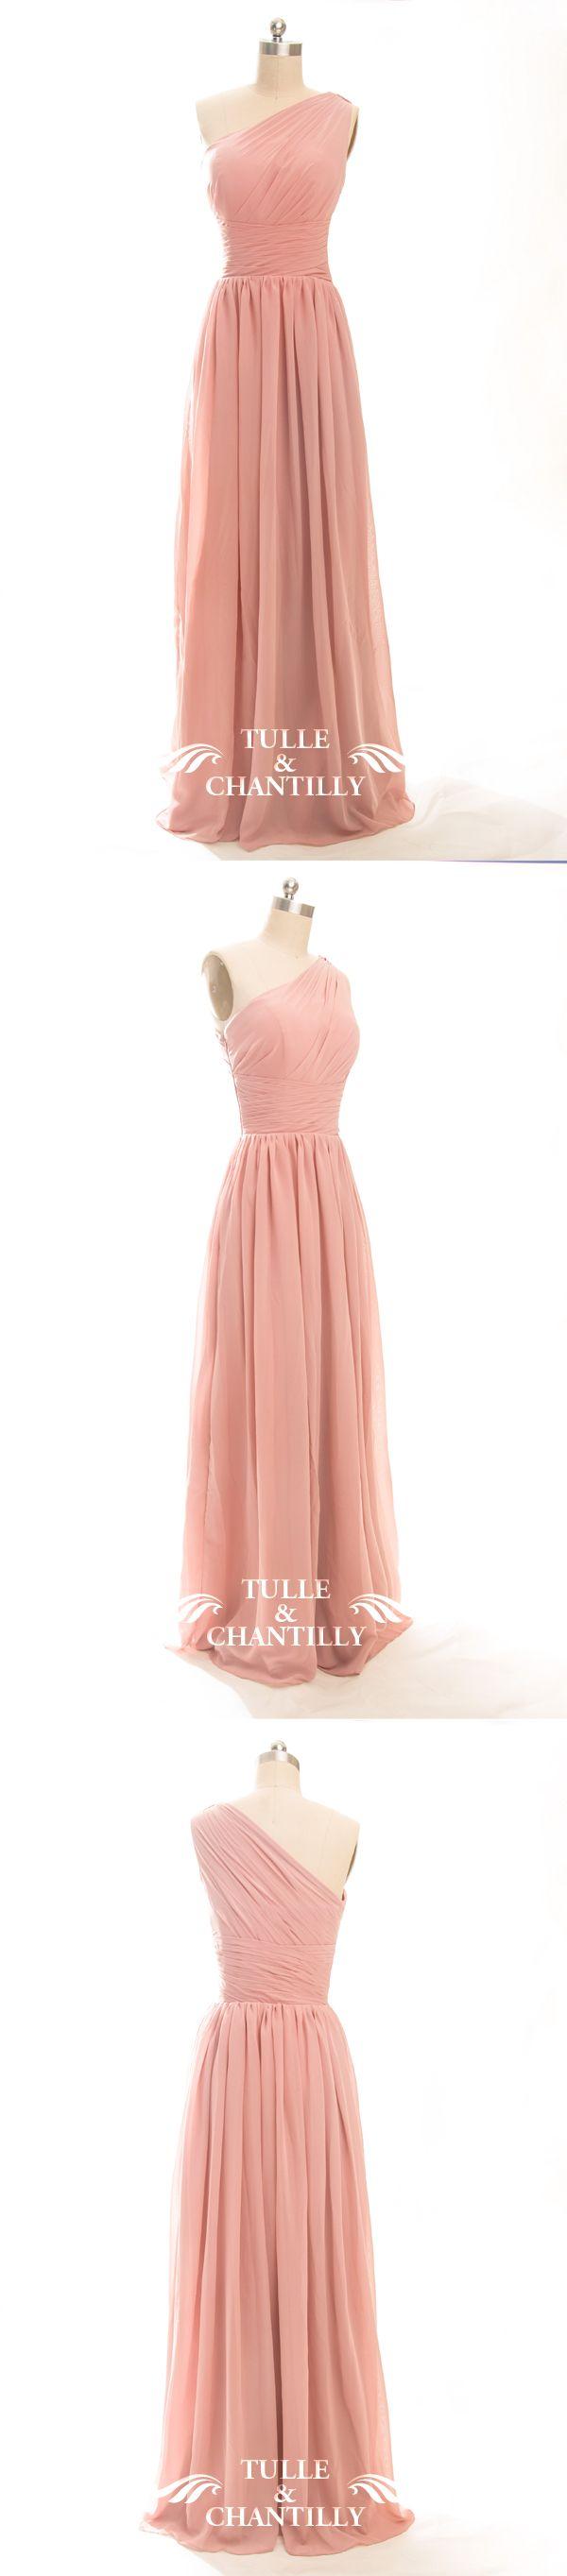 Long One Shoulder Bridesmaid Dress with Sash TBQP246 | Pinterest ...